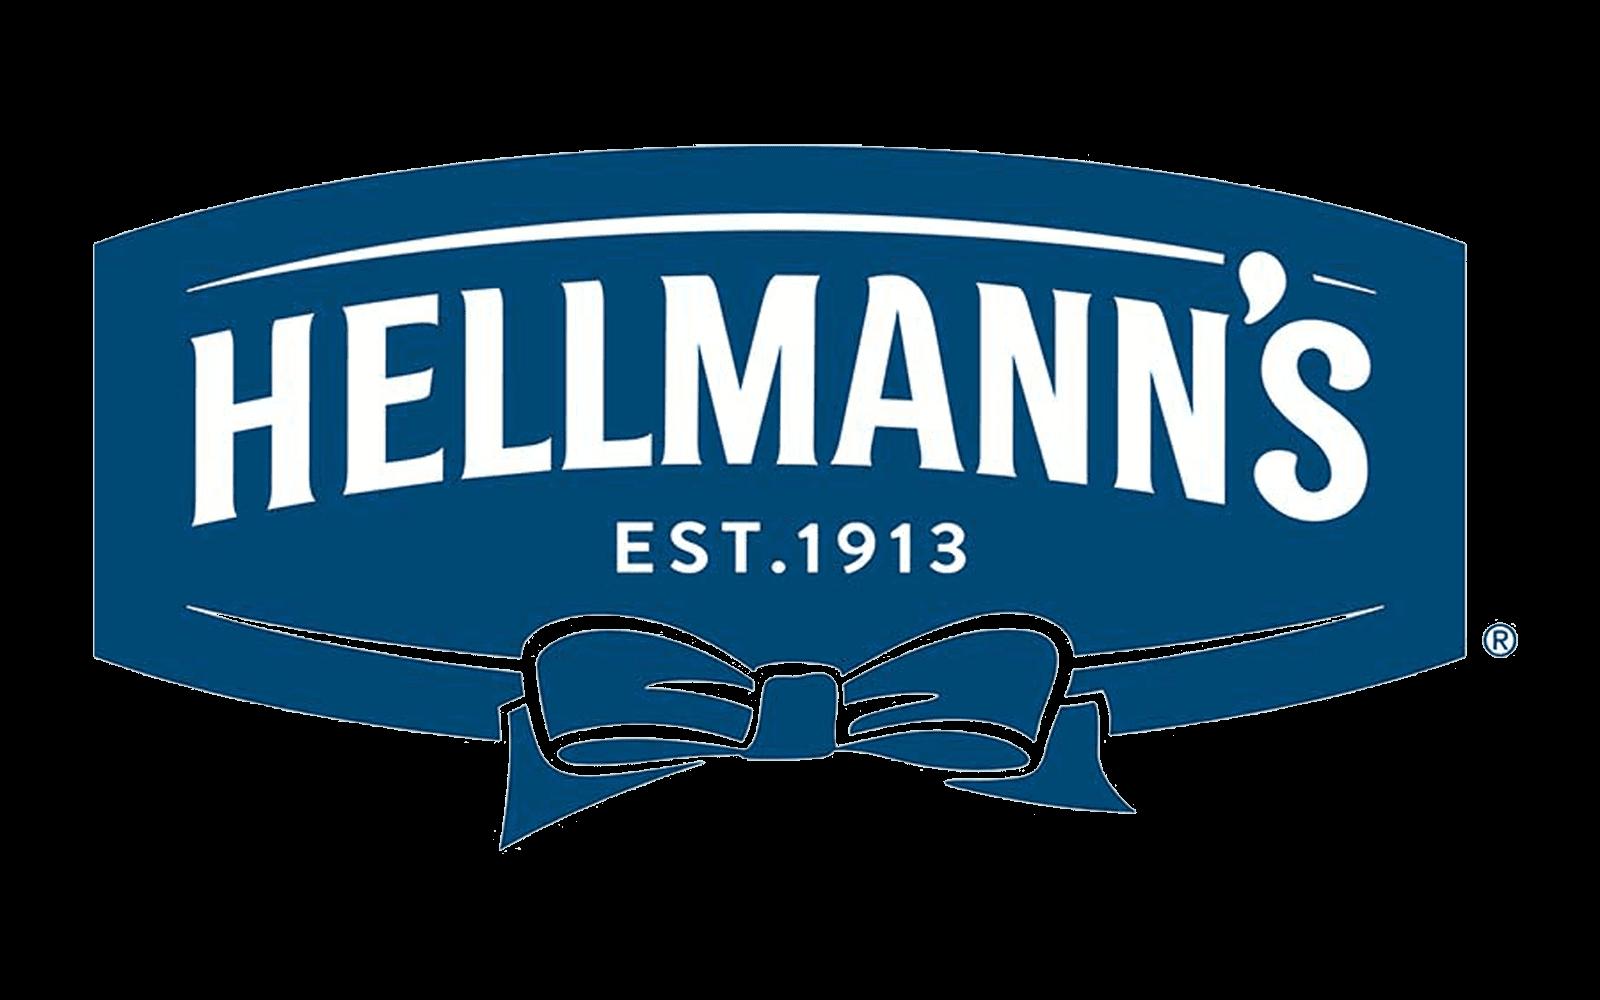 Hellmann's Mayonnaise, 7,/586 Cases, Ext. Retail $86,388, Jacksonville, FL